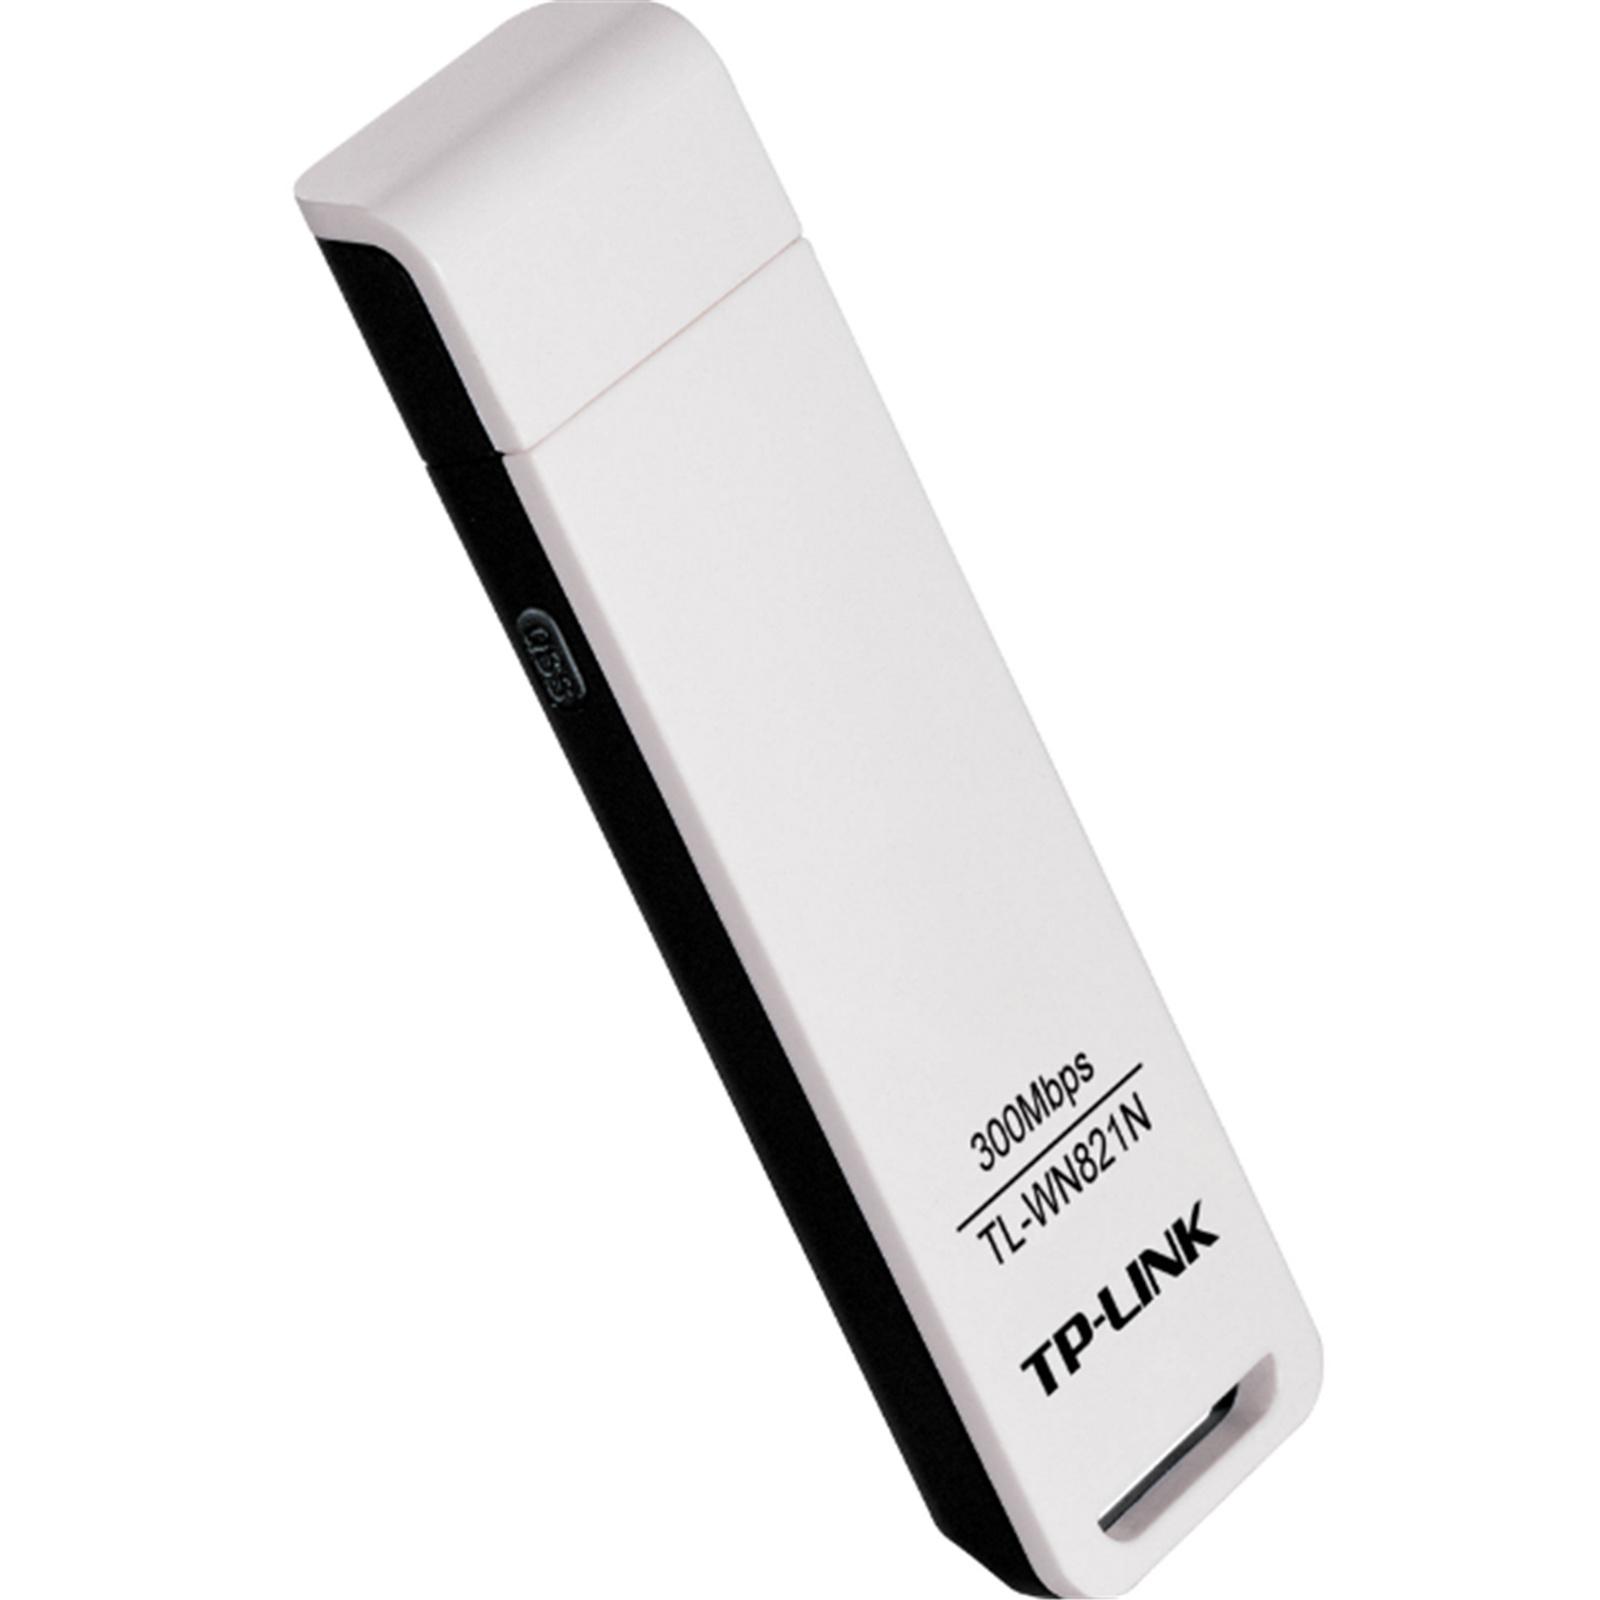 Buy the TP-Link TL-WN821N N300 USB Wi-Fi Adapter ( TL-WN821N